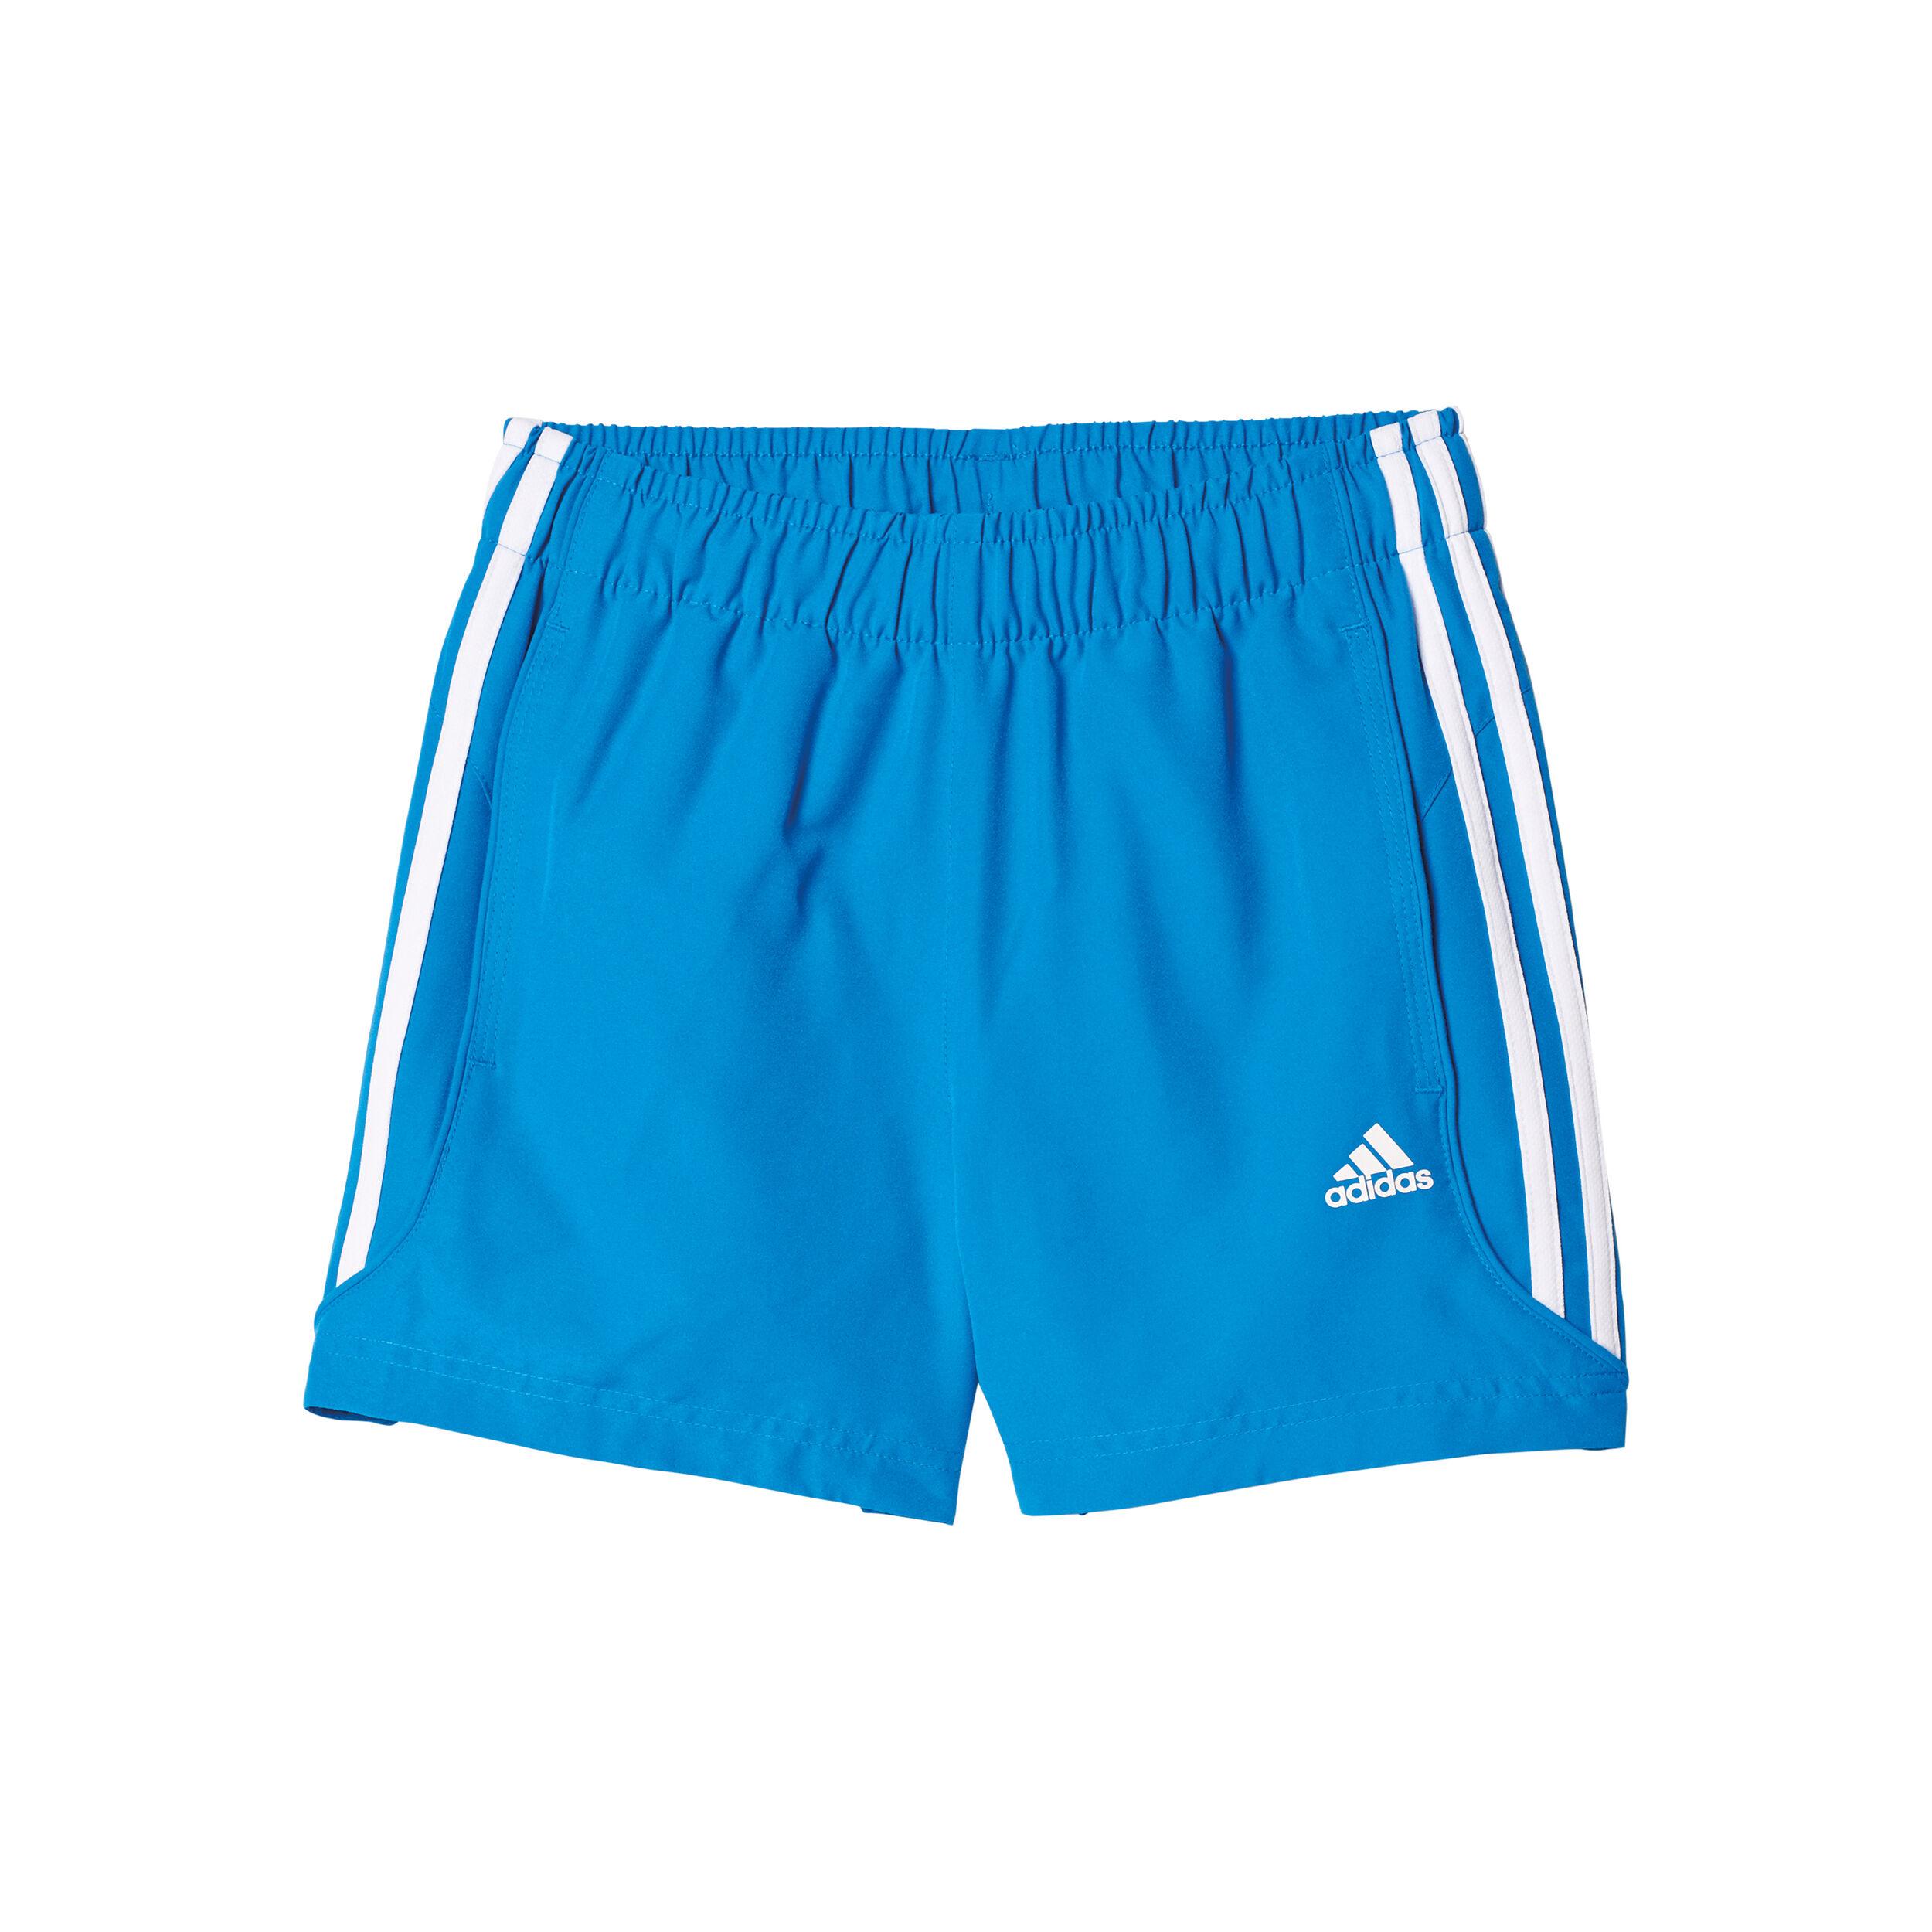 adidas Essentials 3 Stripes Chelsa Shorts Jungen Blau